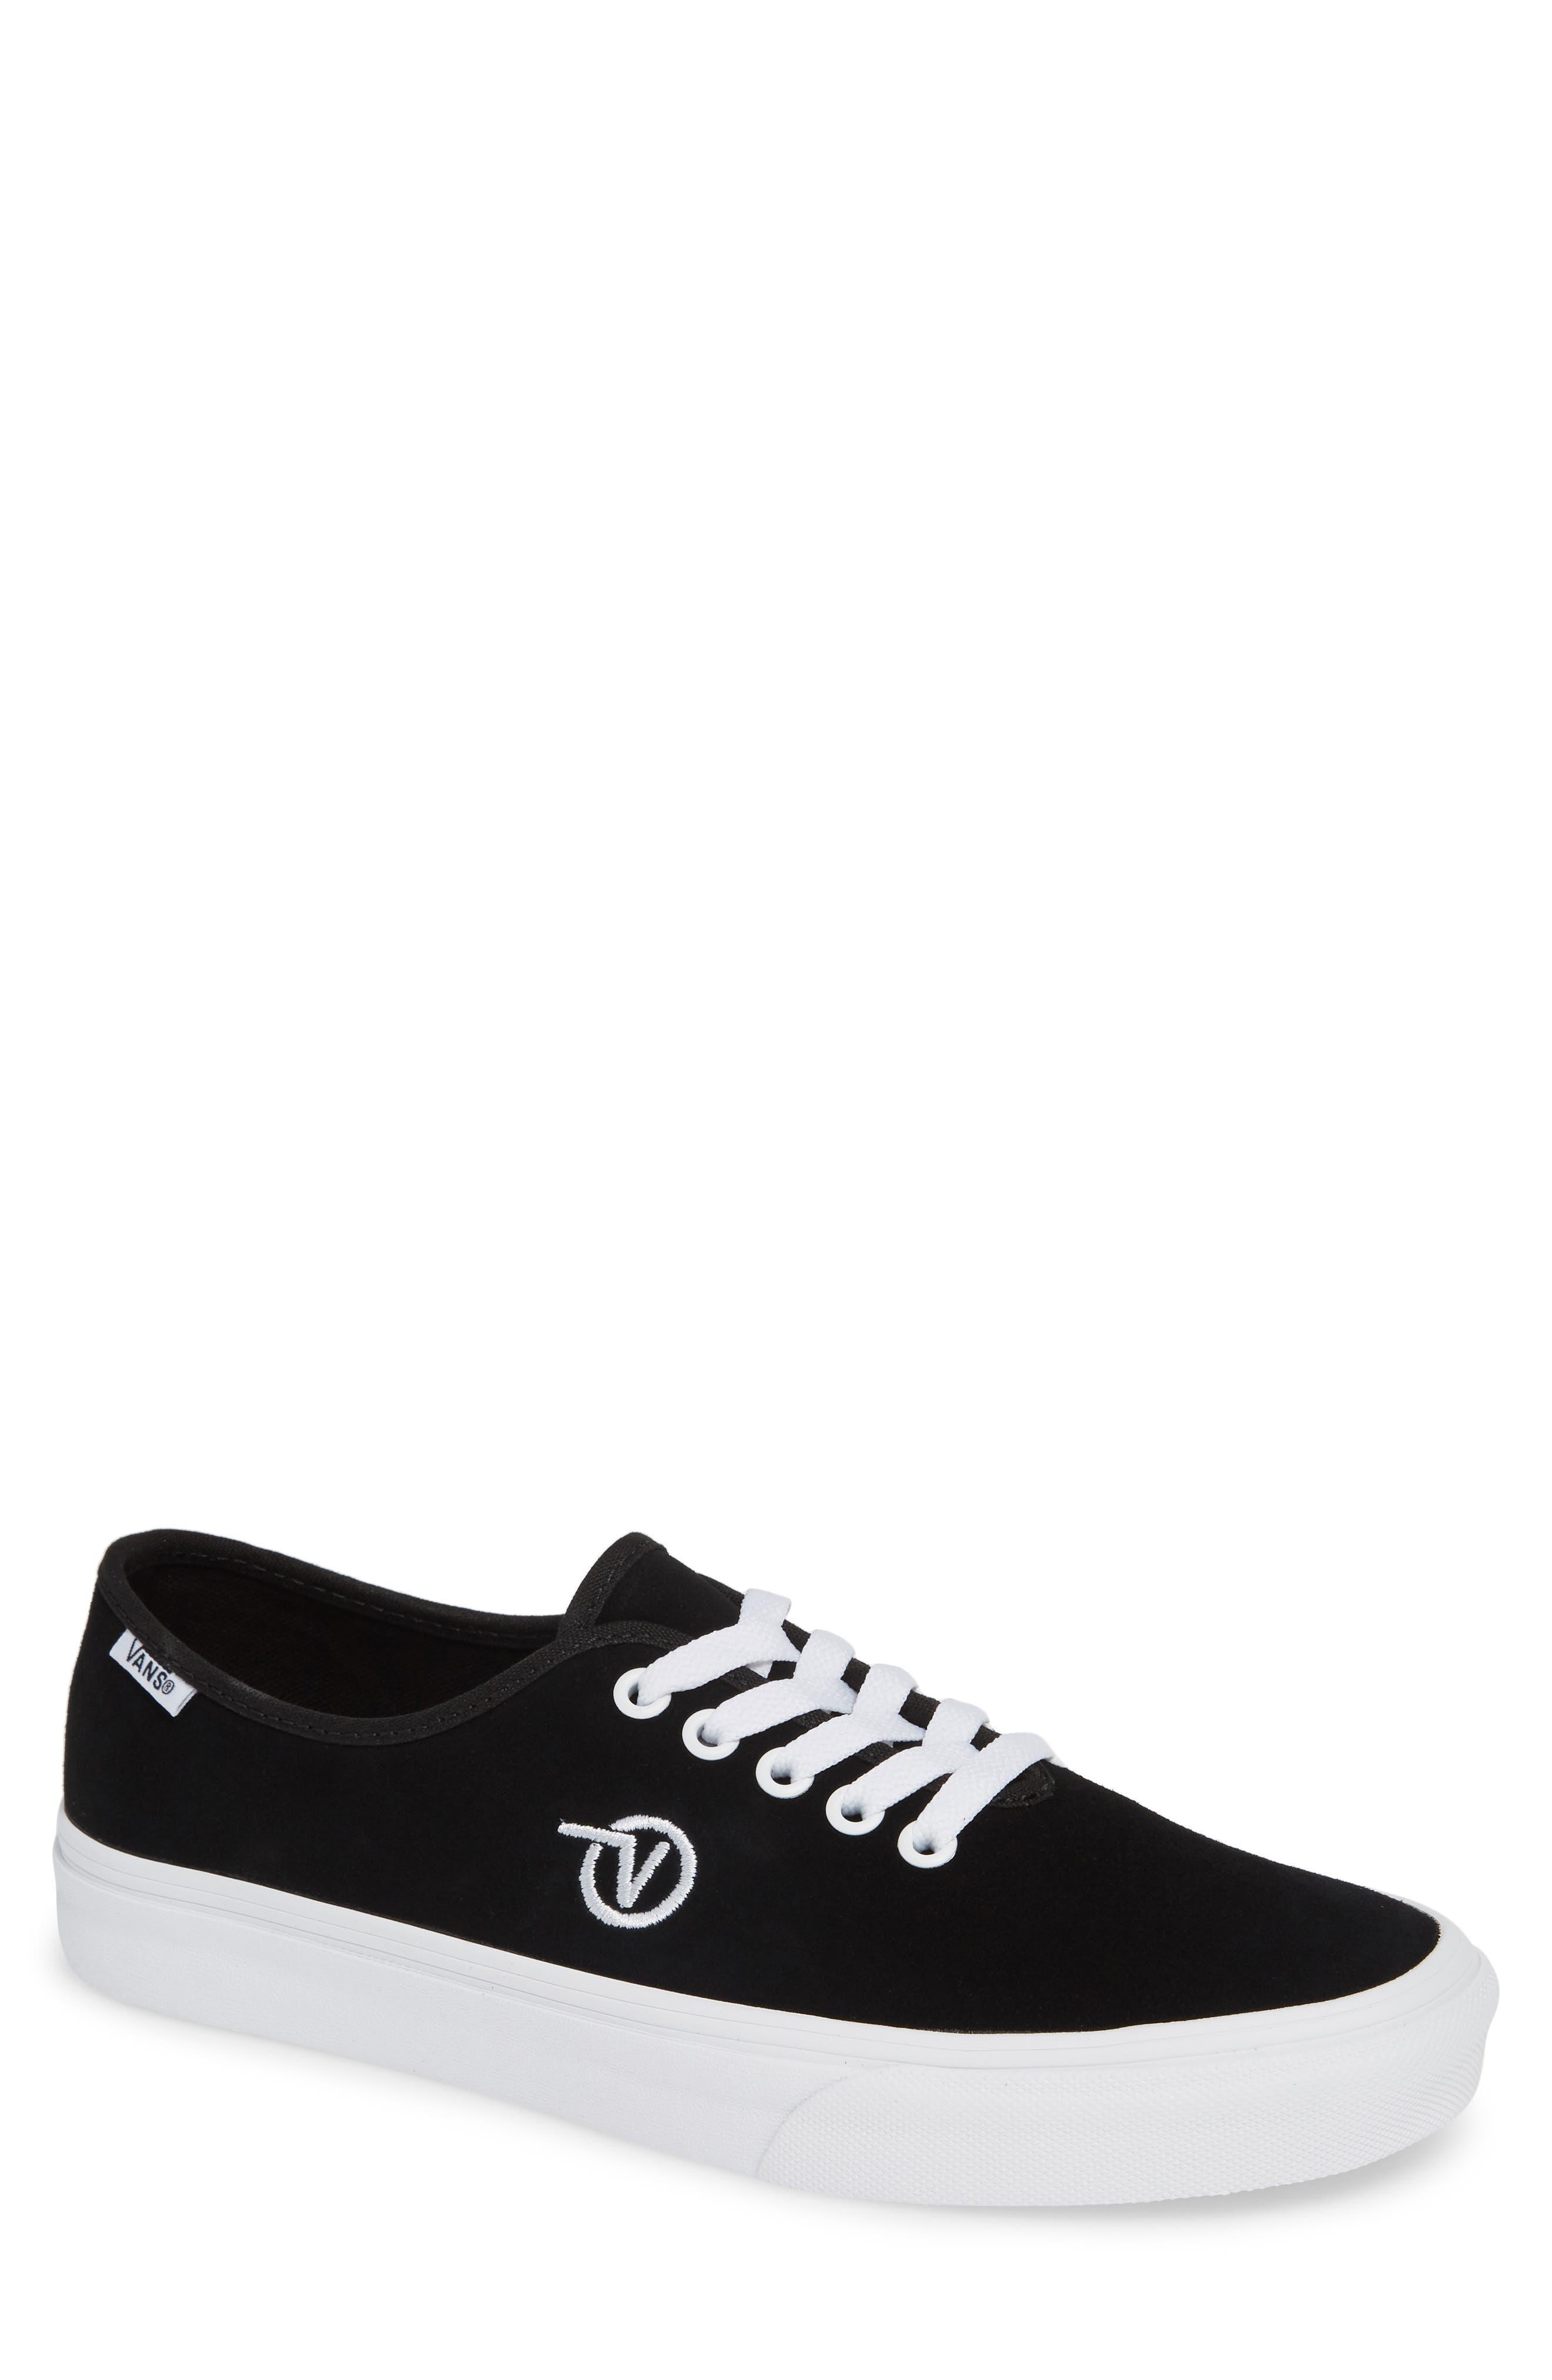 Authentic One-Piece Sneaker,                             Main thumbnail 1, color,                             BLACK/ SUEDE